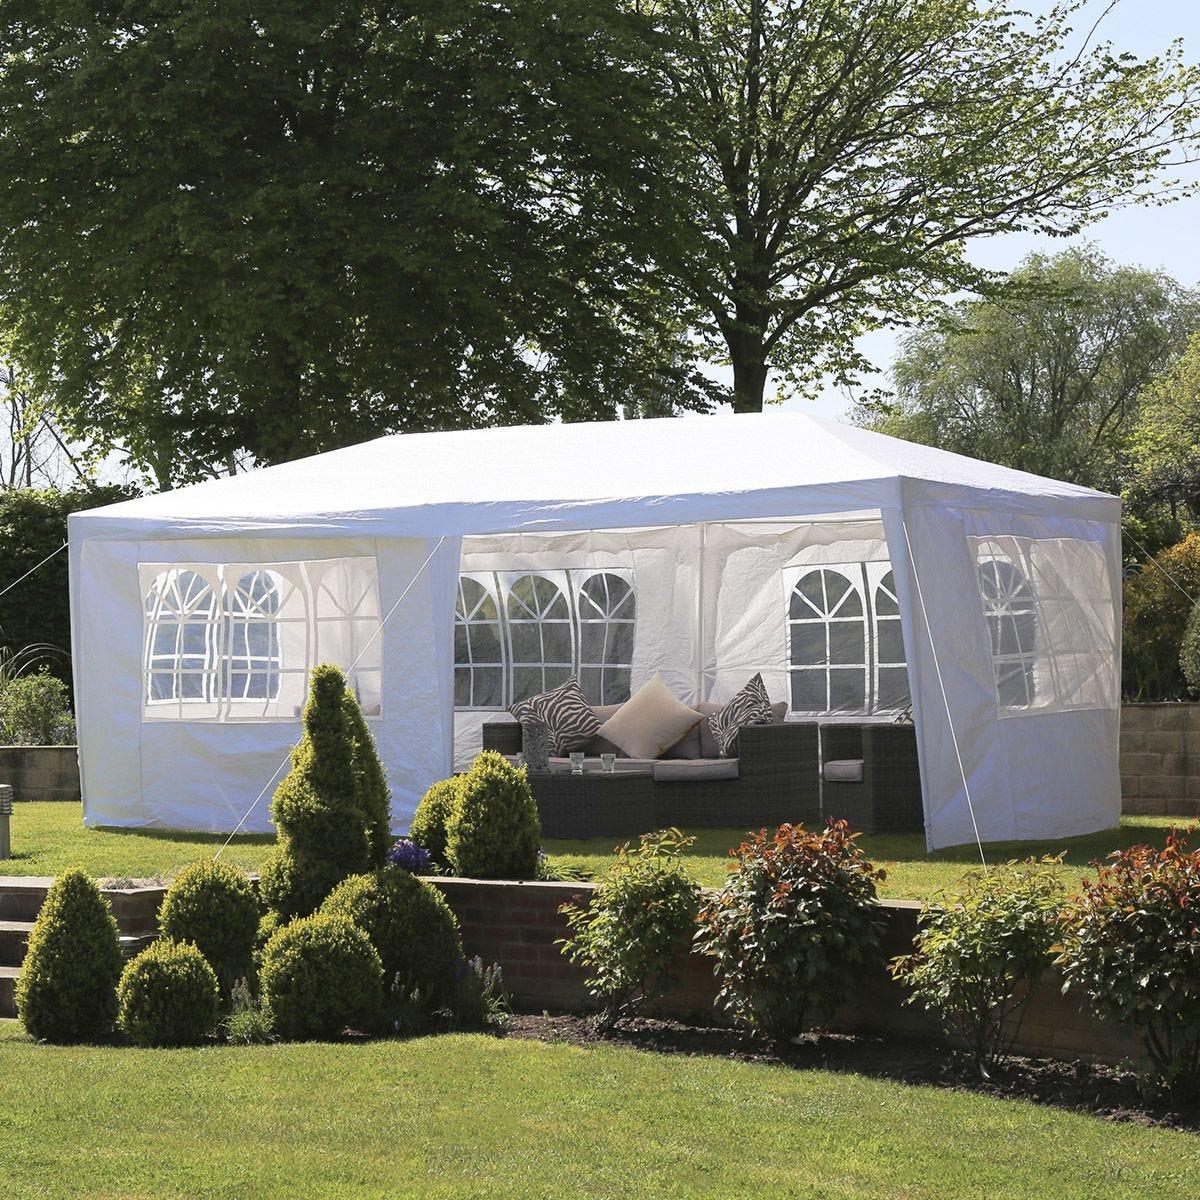 Charles Bentley 3 x 6m PE Gazebo with Side Panels - White